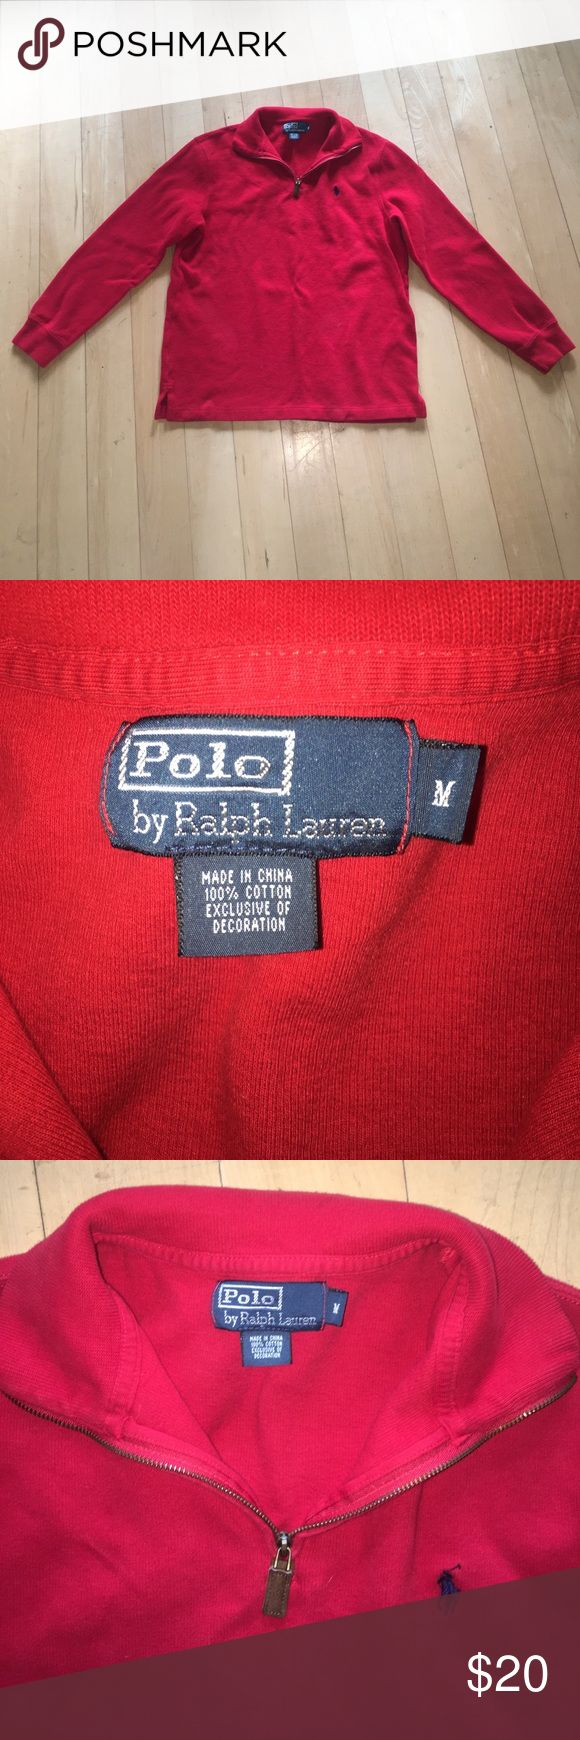 Polo by Ralph Lauren Men's Medium pullover Red Polo by Ralph Lauren pullover sweatshirt. Size: Men's Medium. Red Polo by Ralph Lauren Sweaters Crewneck